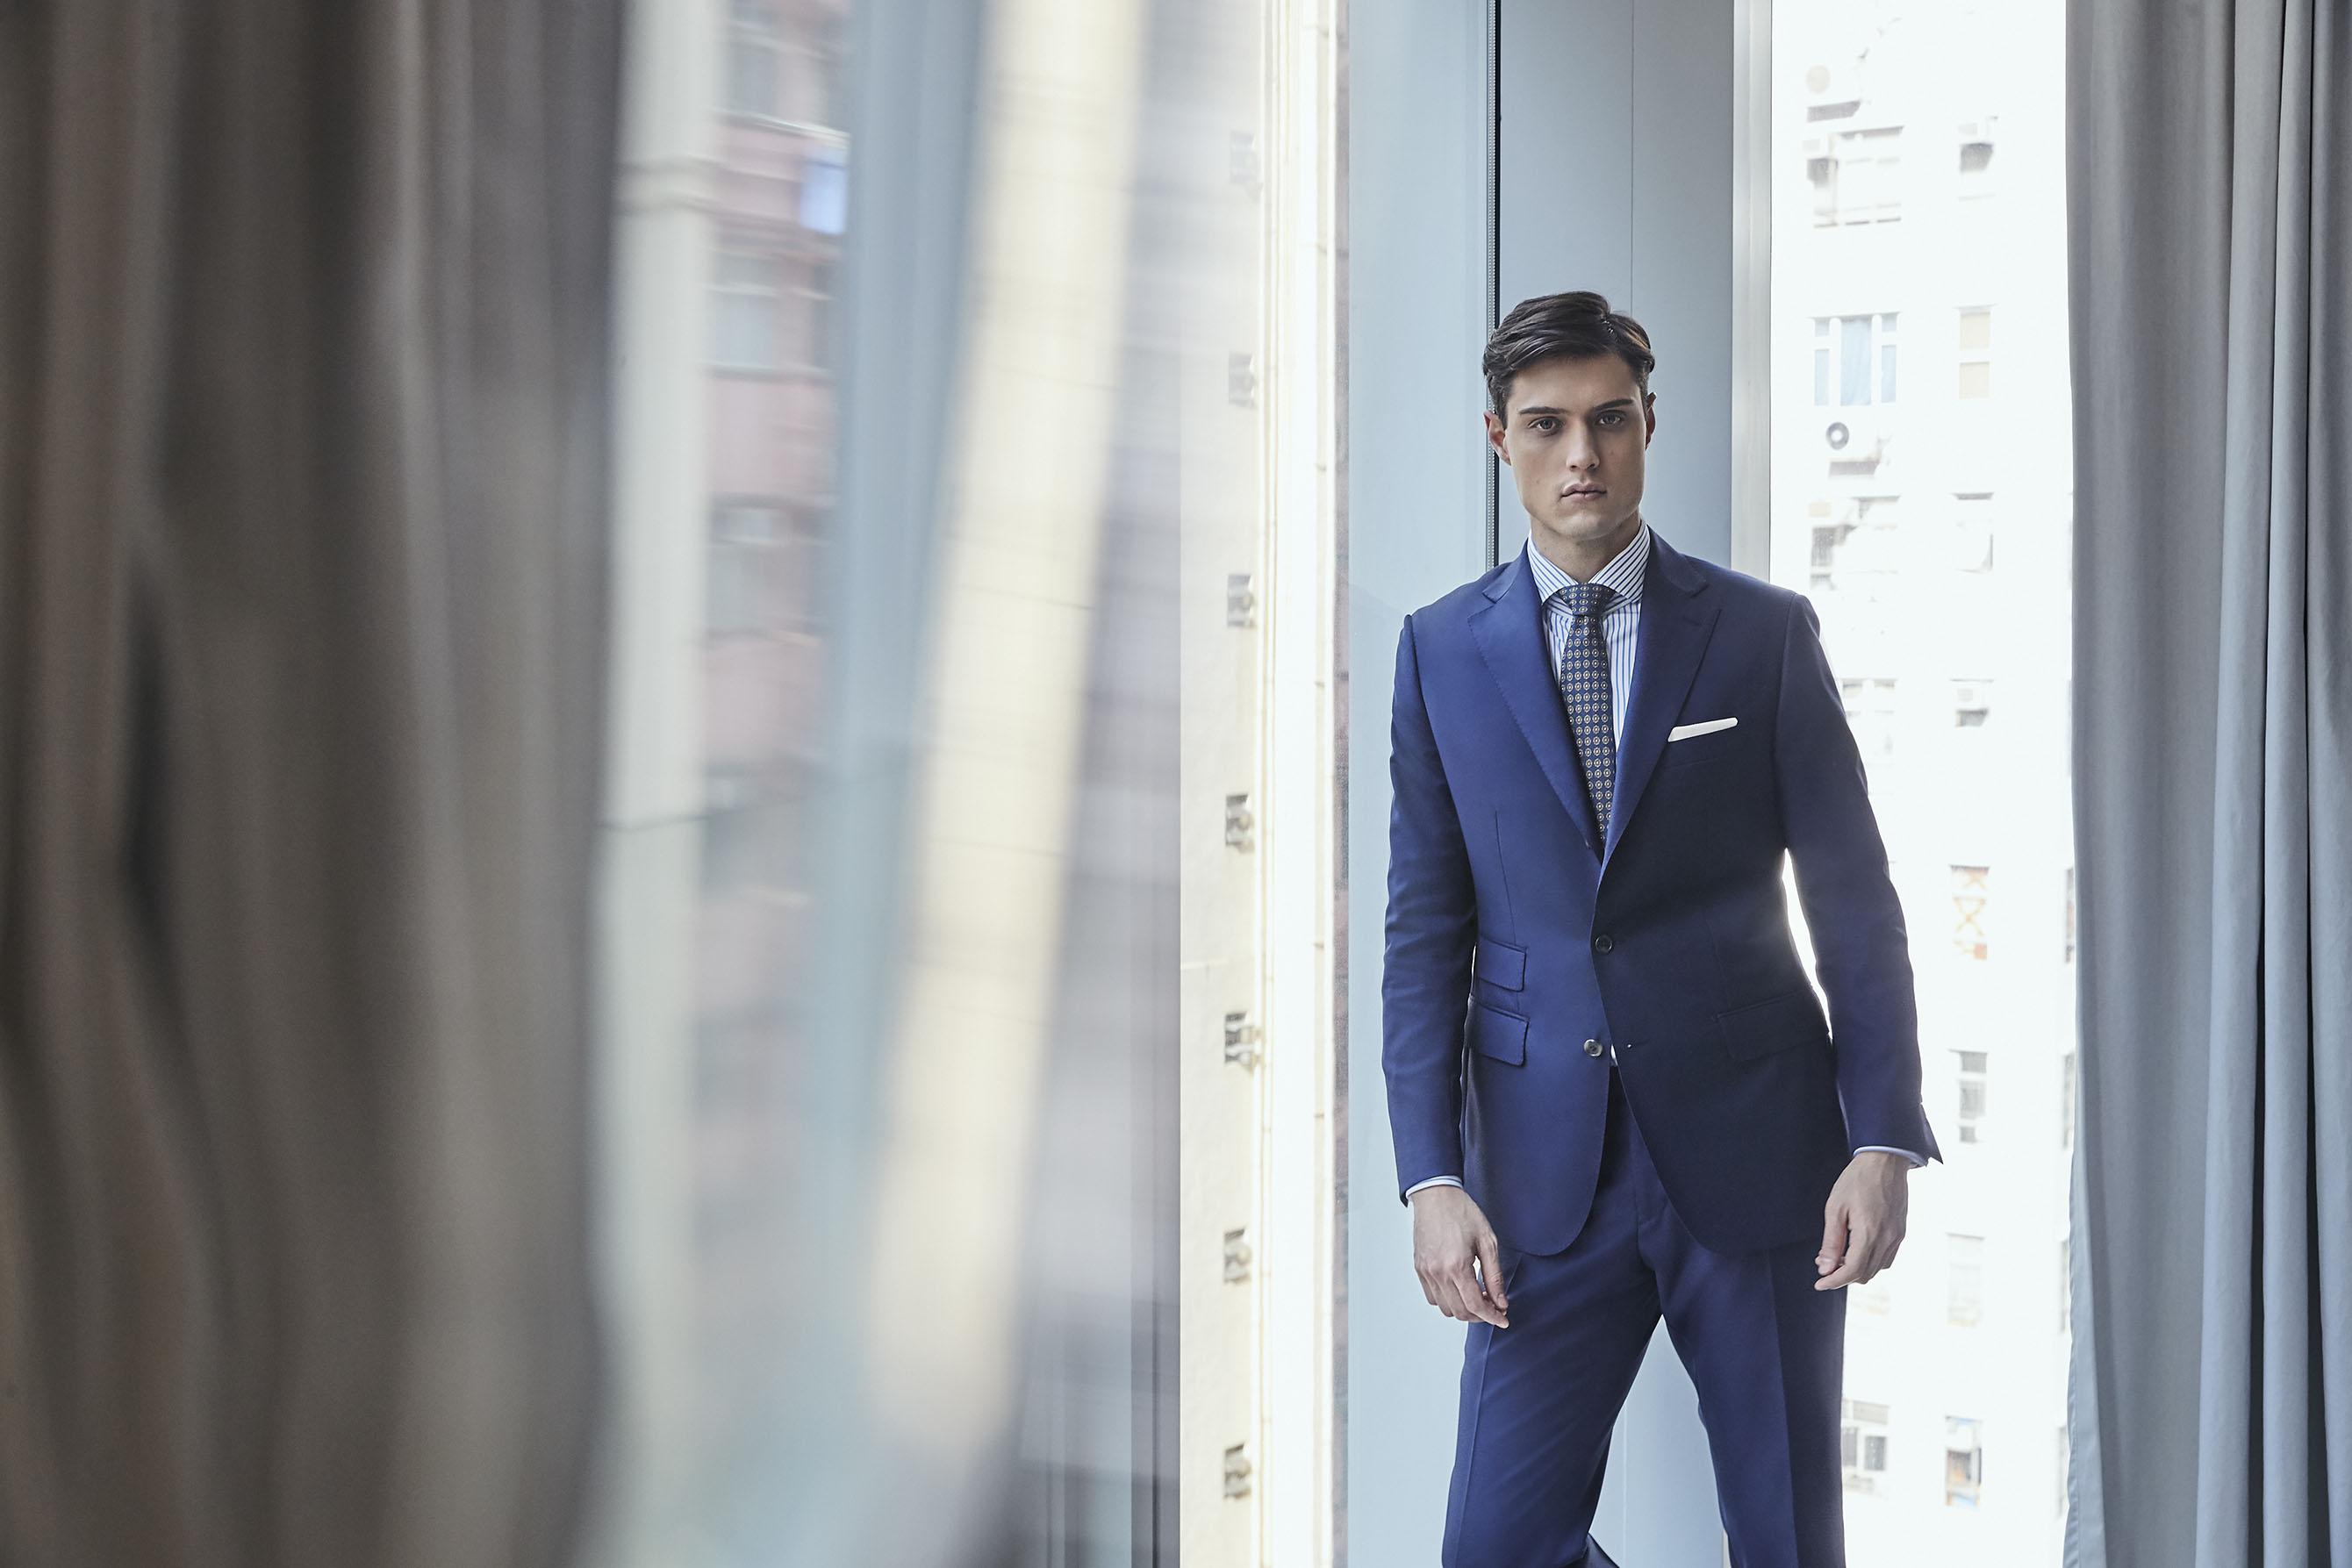 Bespoke suit campaign